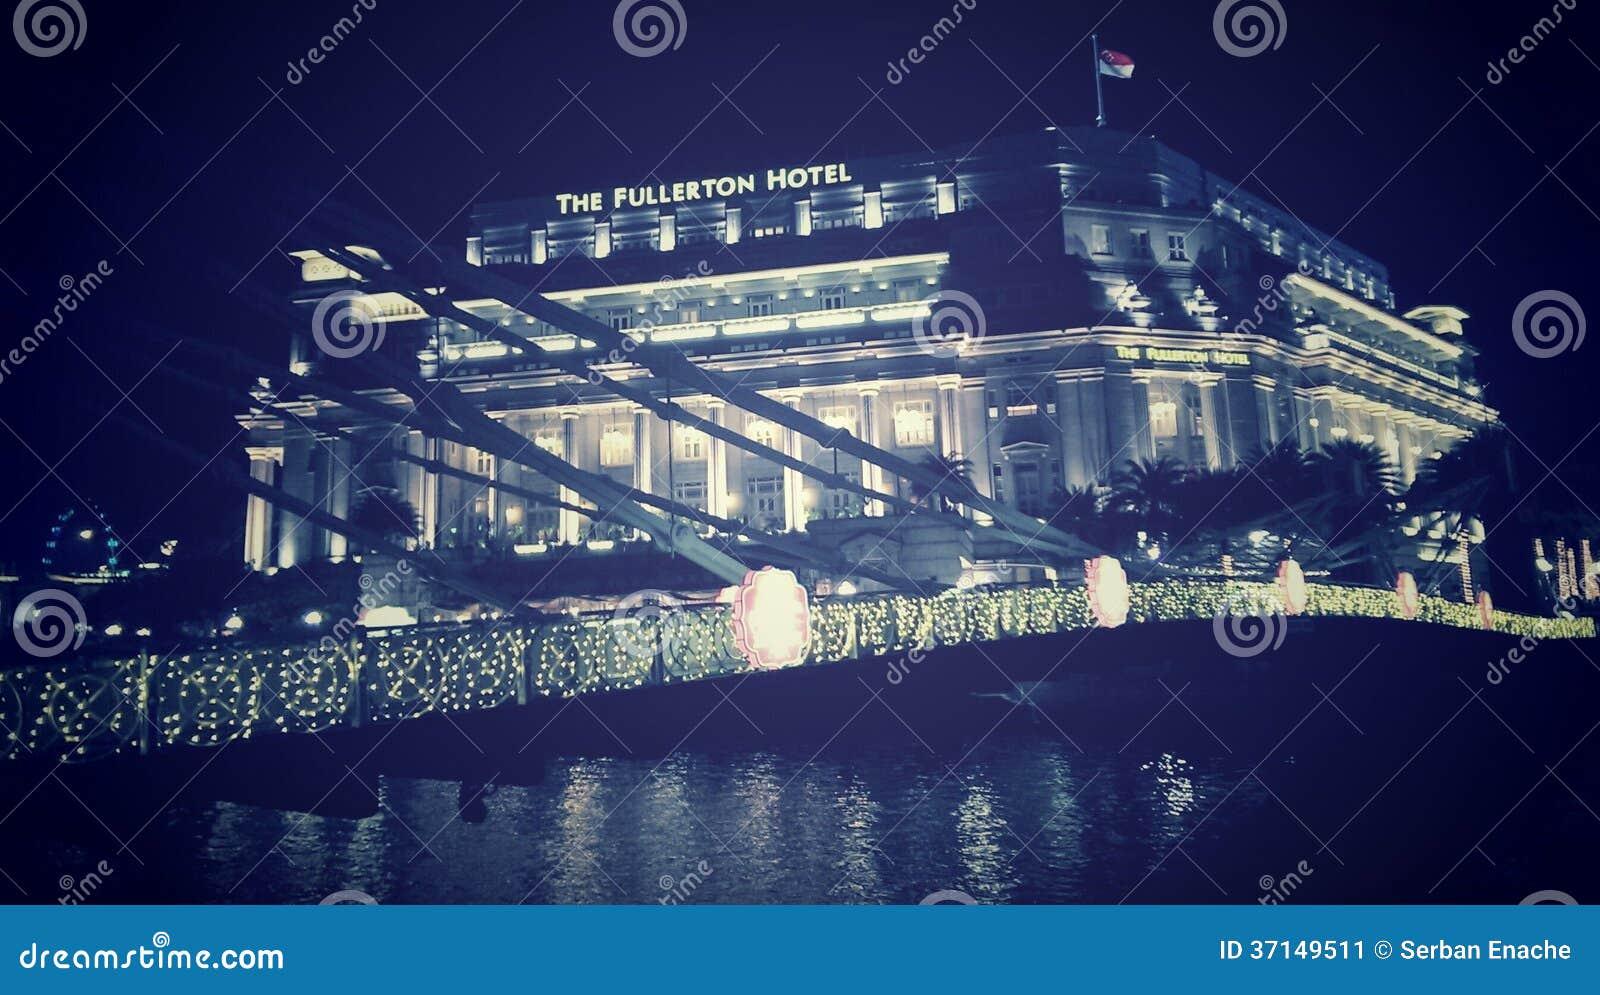 The Fullerton Bay Hotel Singapore - TripAdvisor